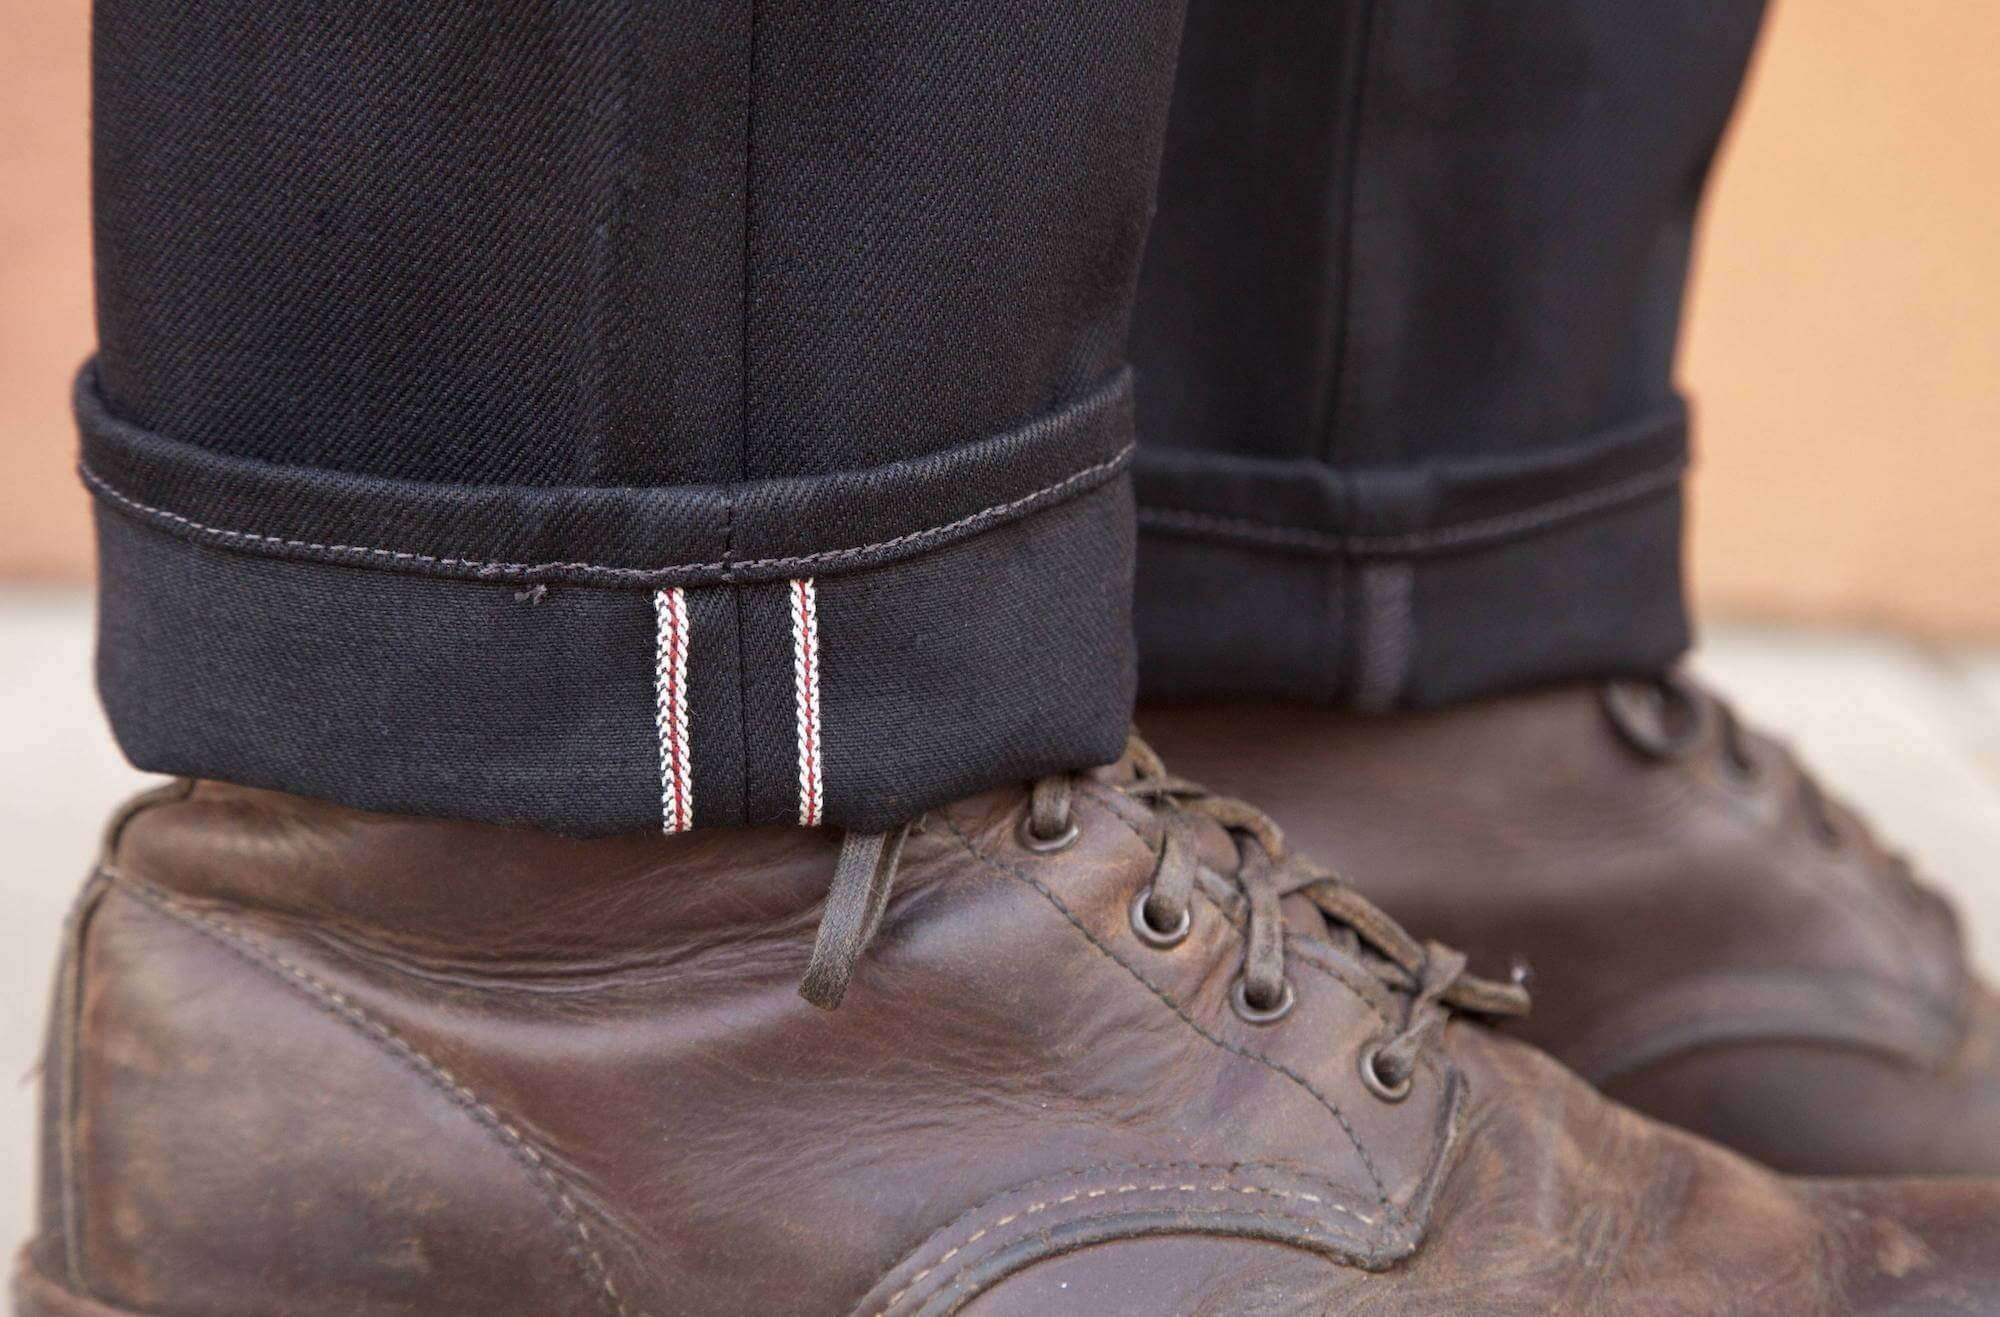 black, selvedge denim jeans